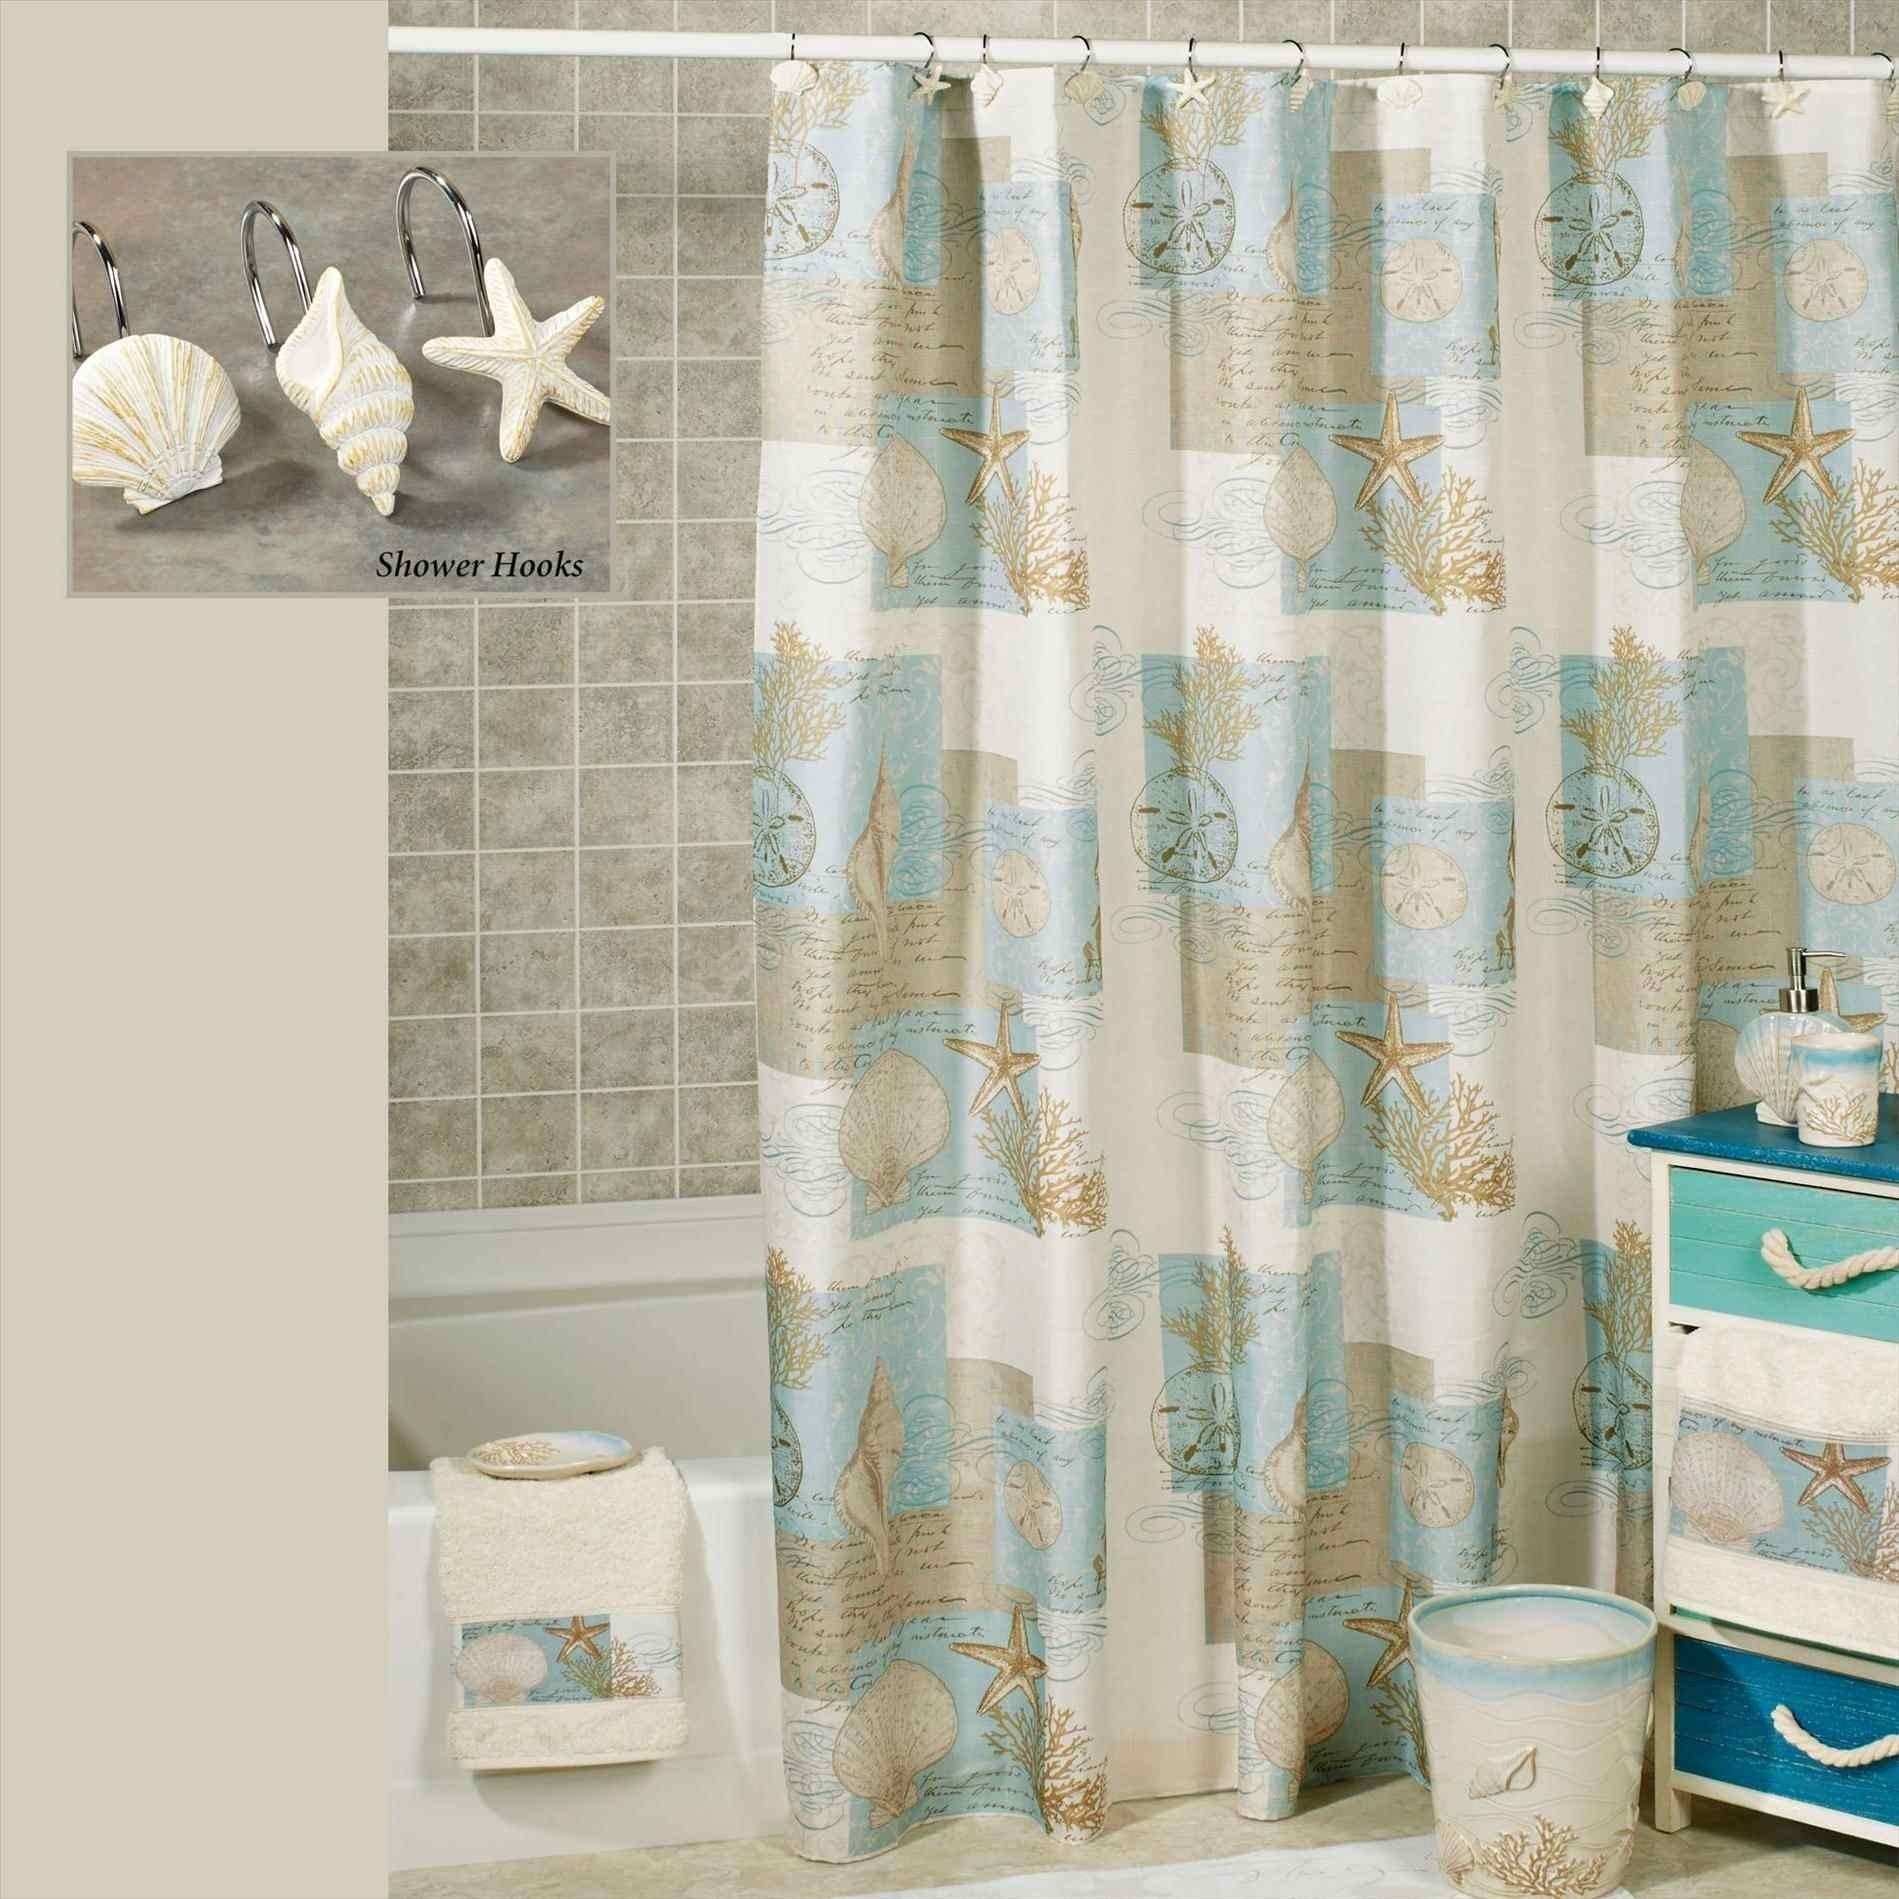 Luxury Target Mermaid Shower Curtain Check More At Homefurnitureone